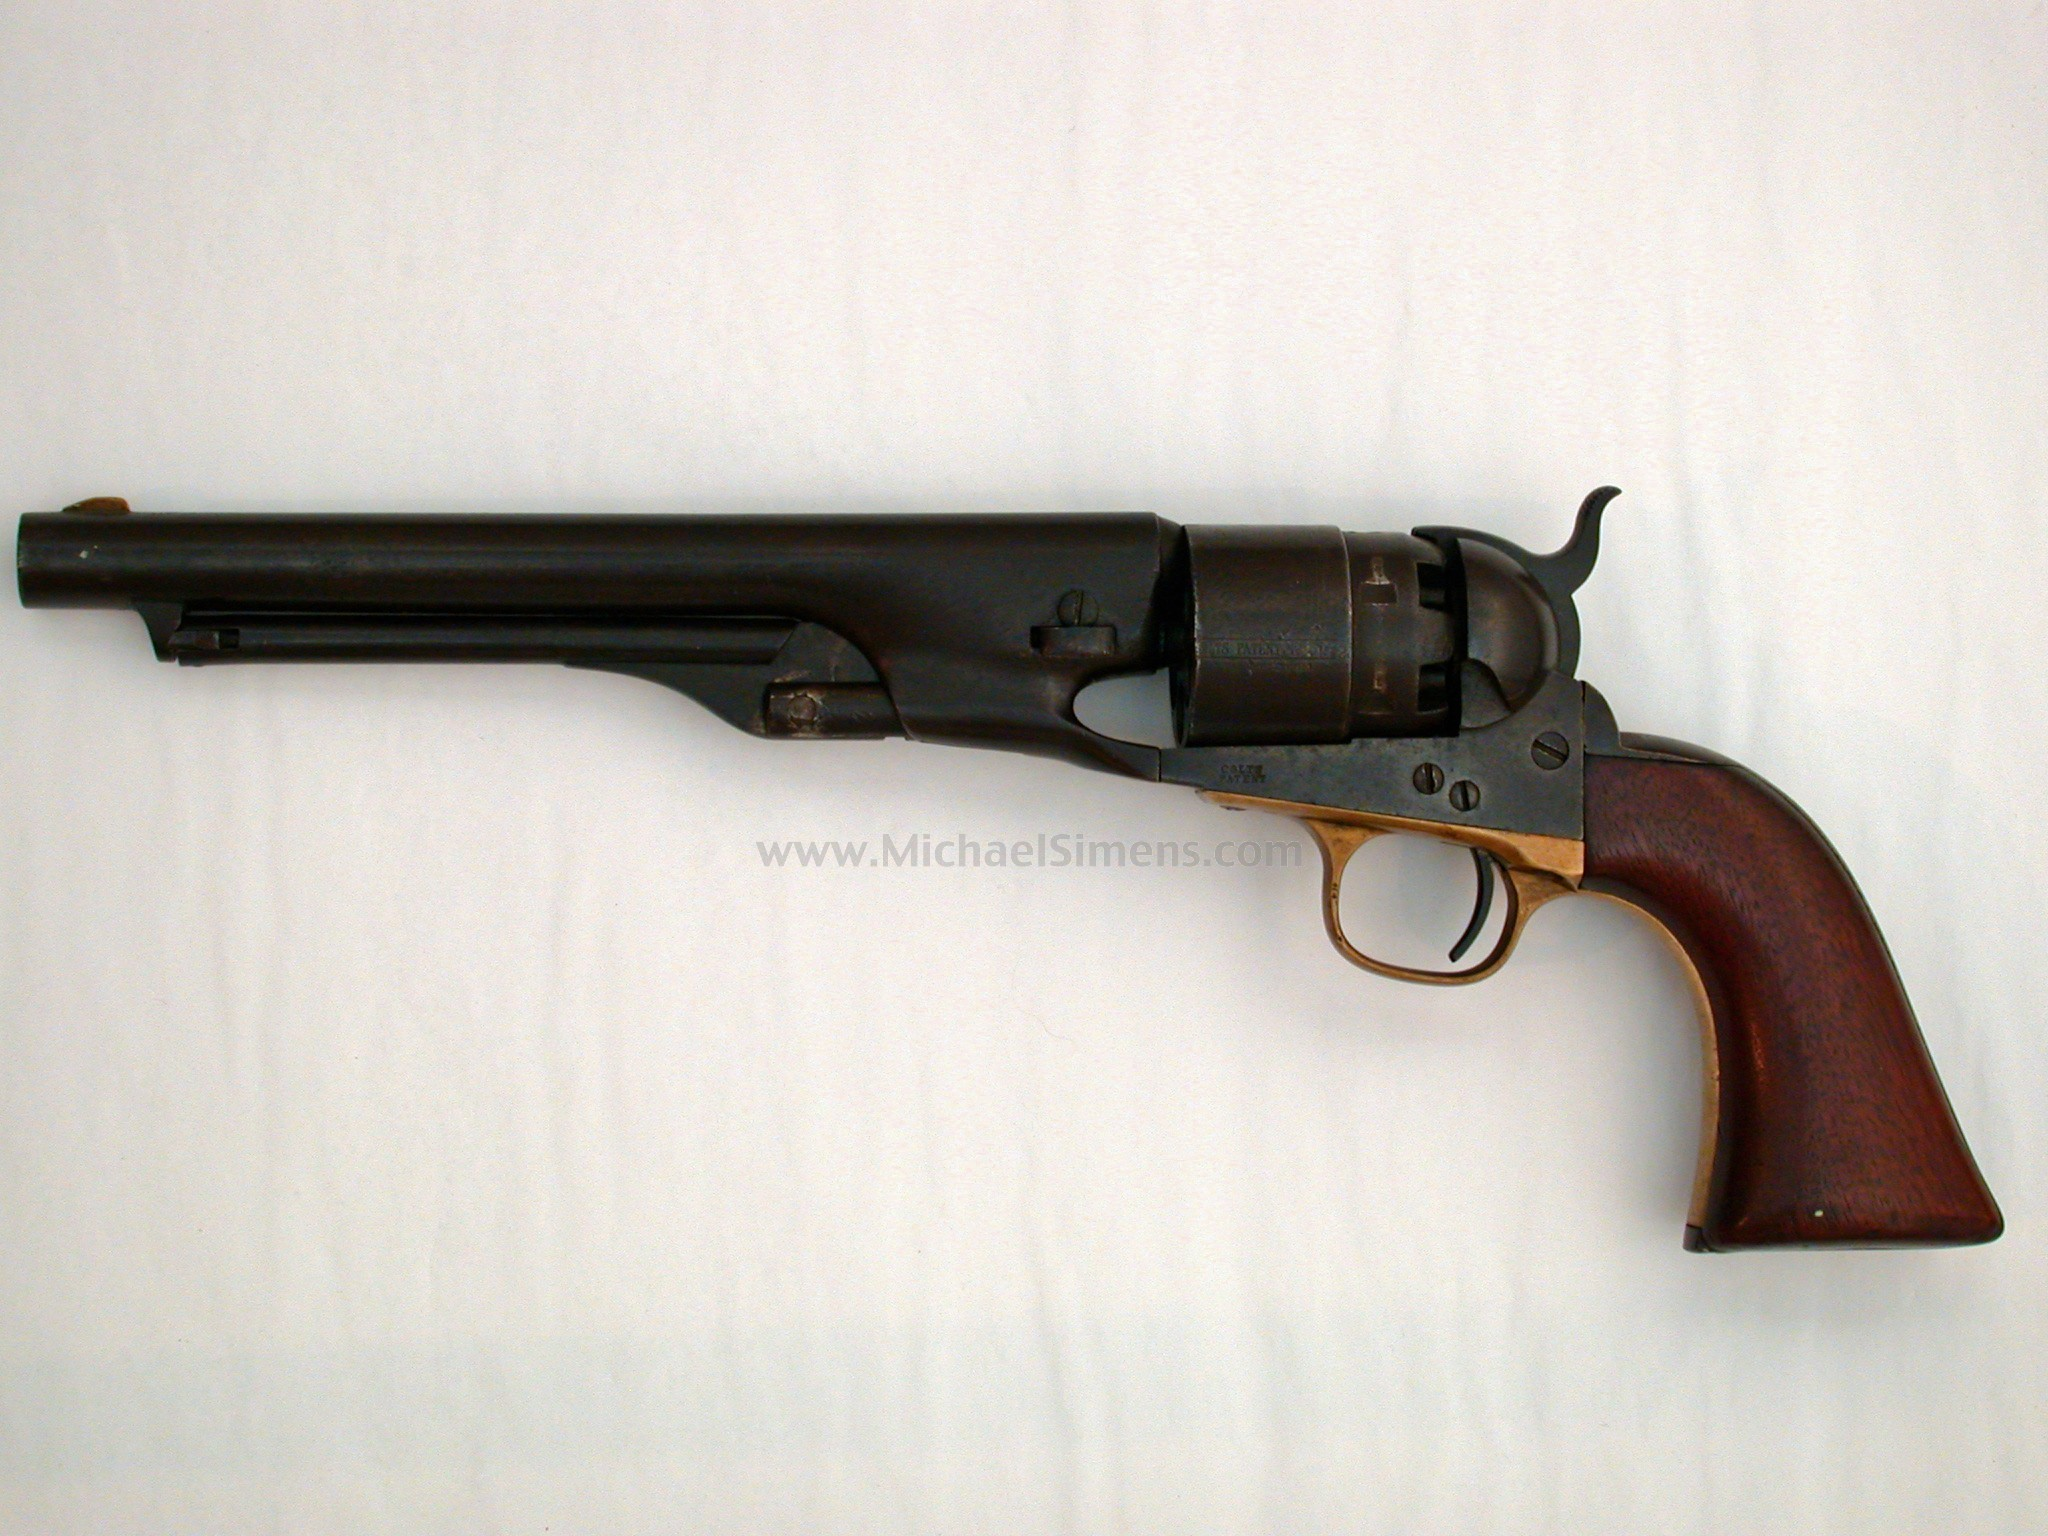 COLT ARMY REVOLVER, MODEL 1860